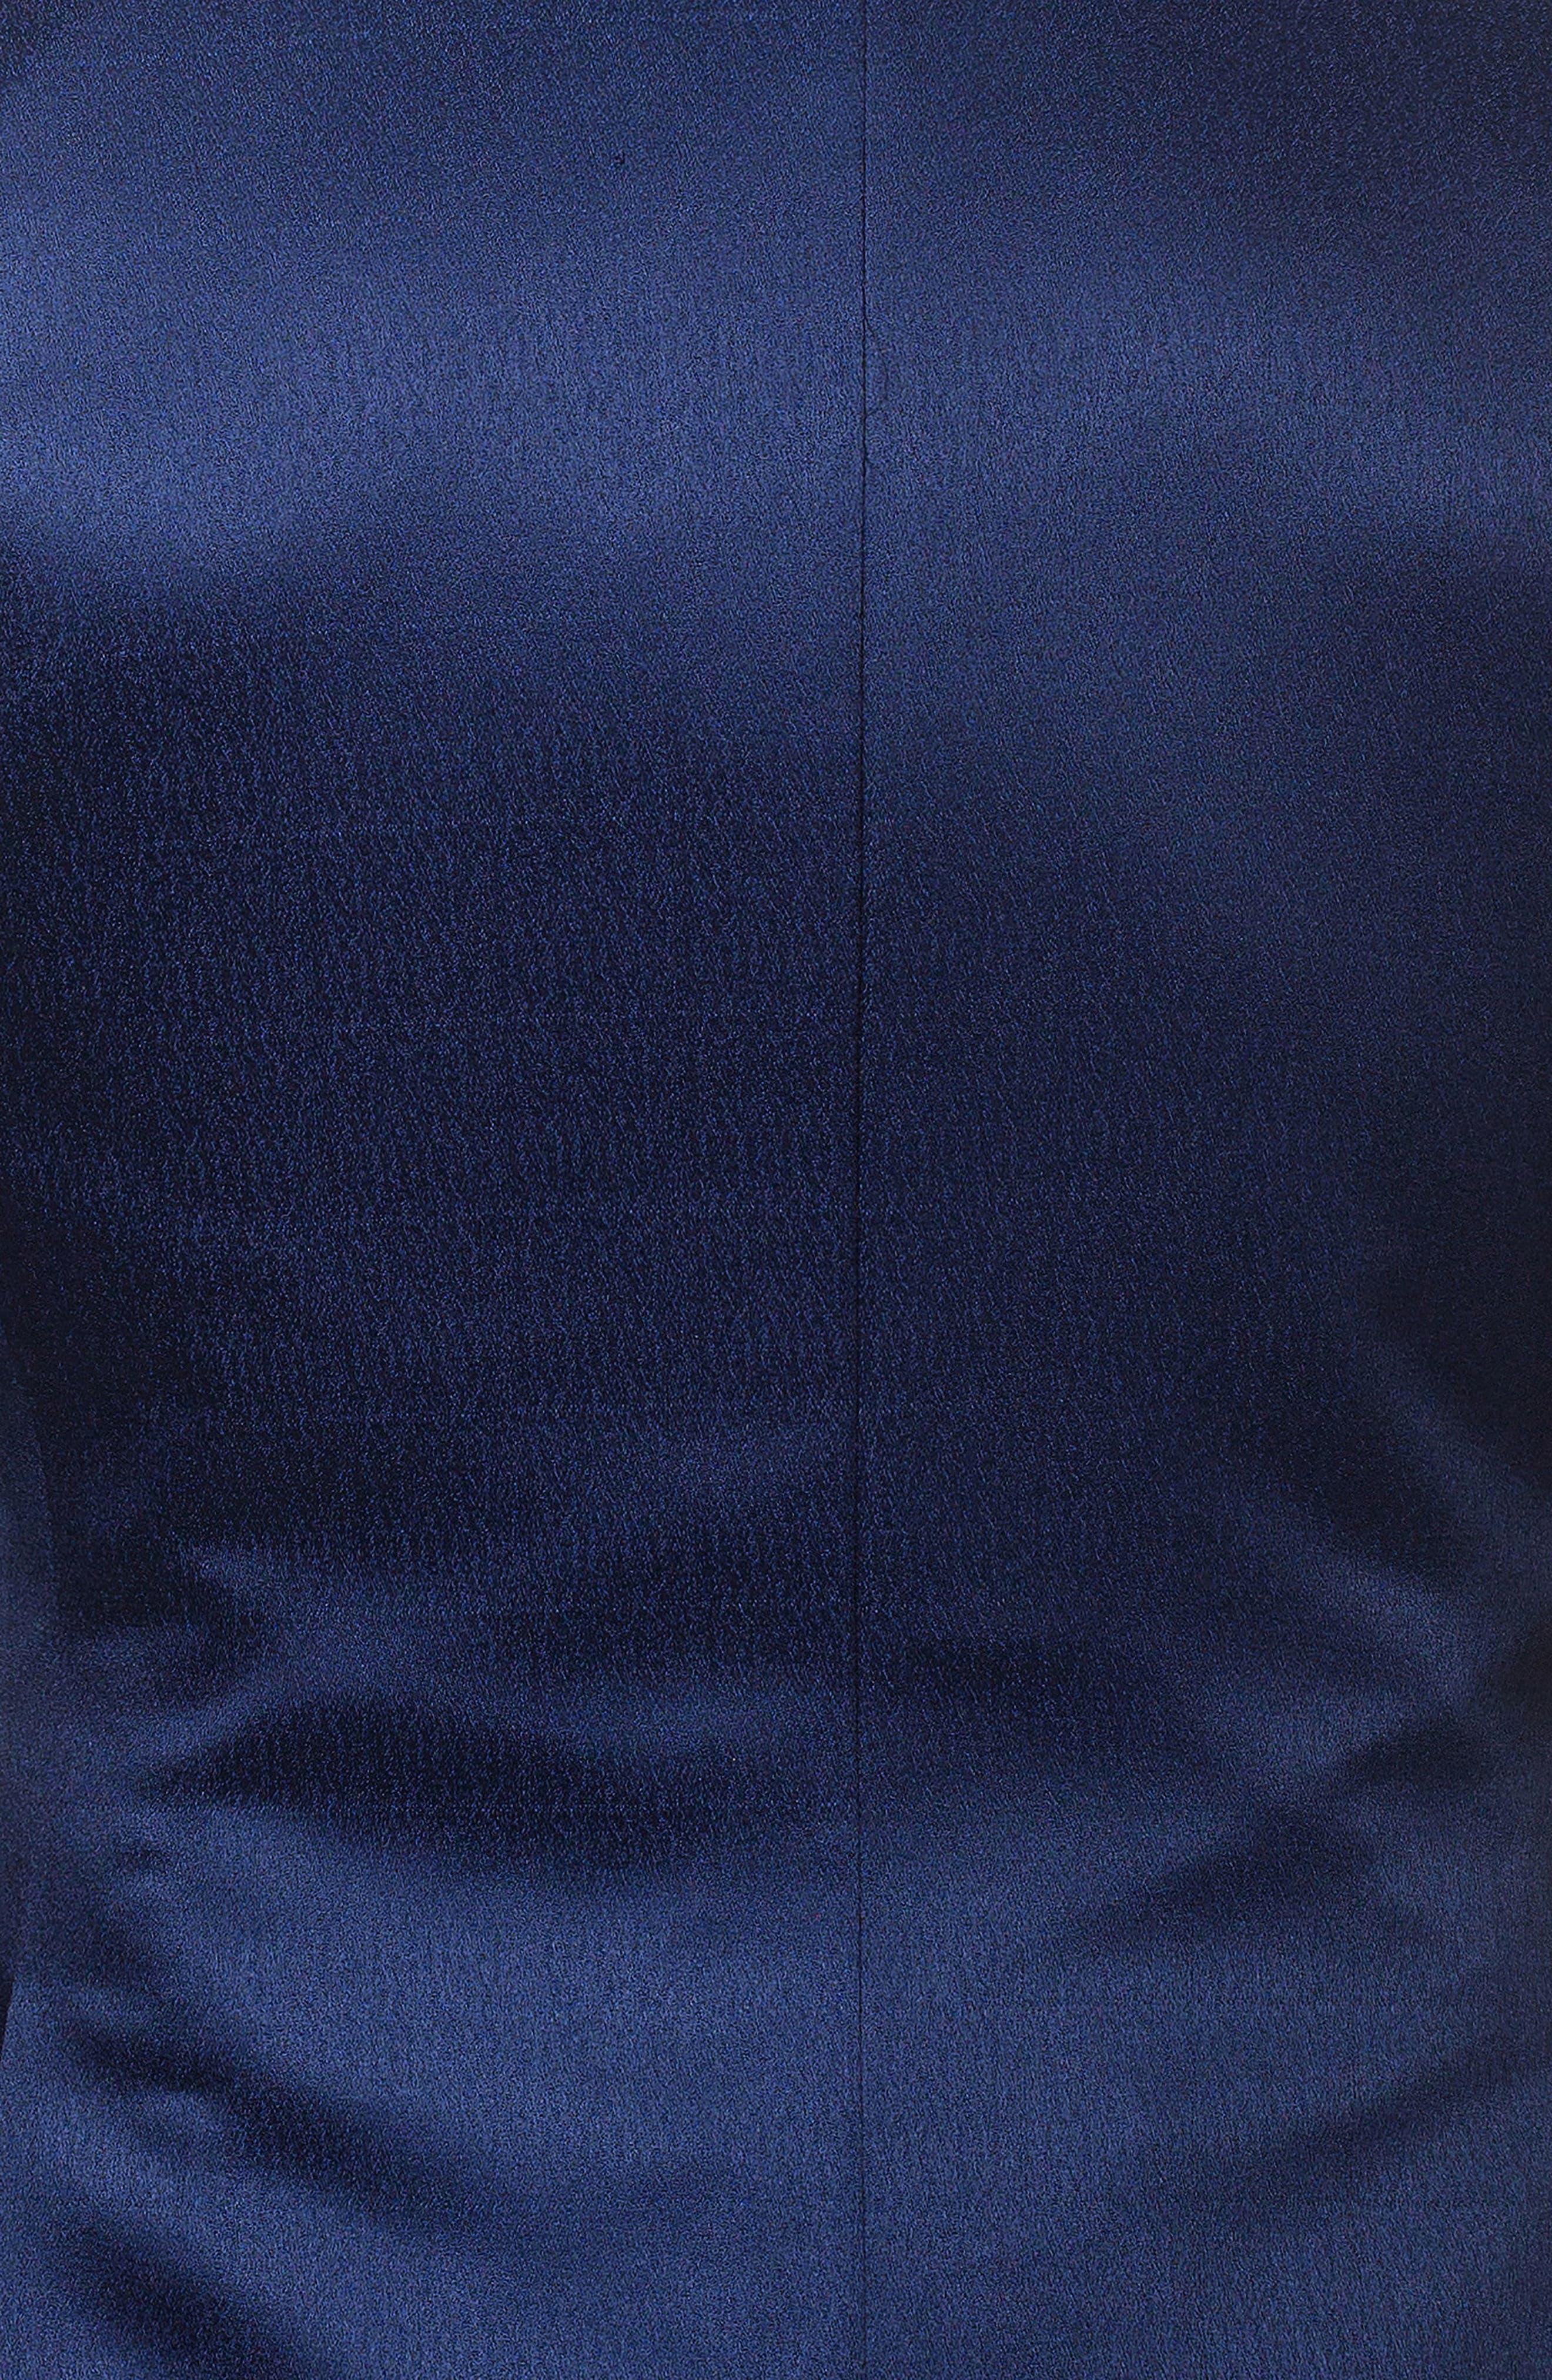 Socrate Evo Catch Blazer,                             Alternate thumbnail 5, color,                             Blue